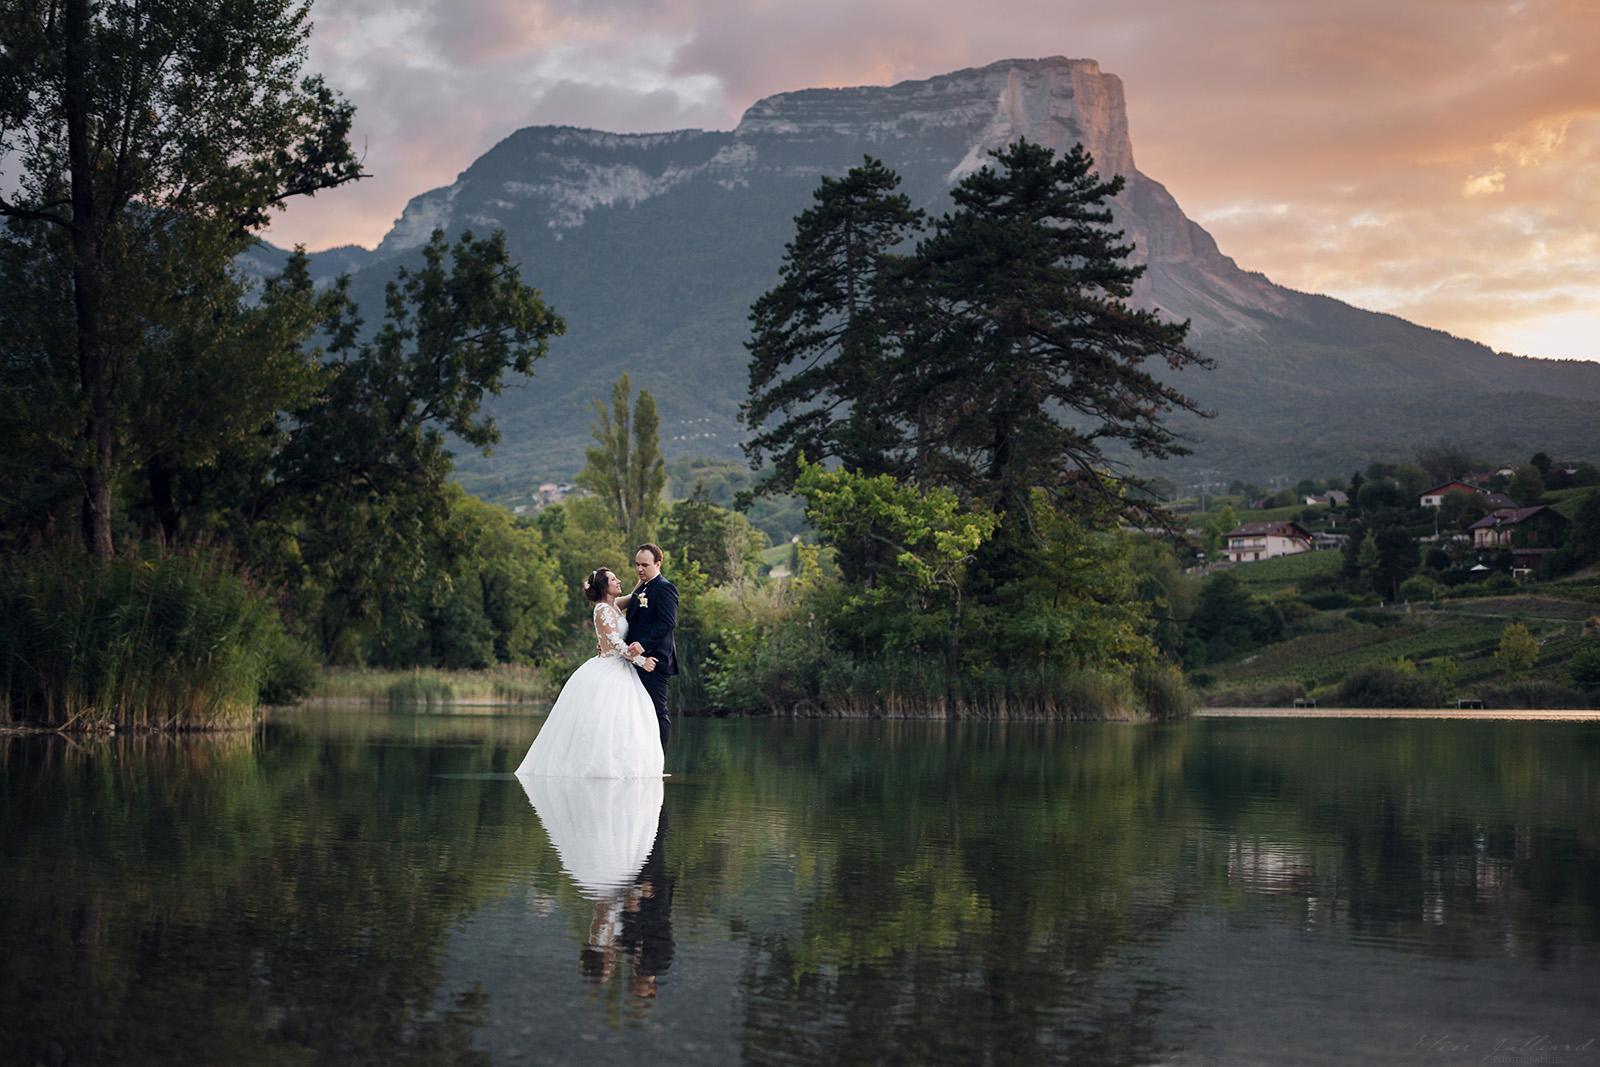 mariage-photographe-elise-julliard-wedding-love-session-lac-saint-andre-auvergne-rhone-alpes-lyon-chambery-seance-photo-couple-trash-the-dress